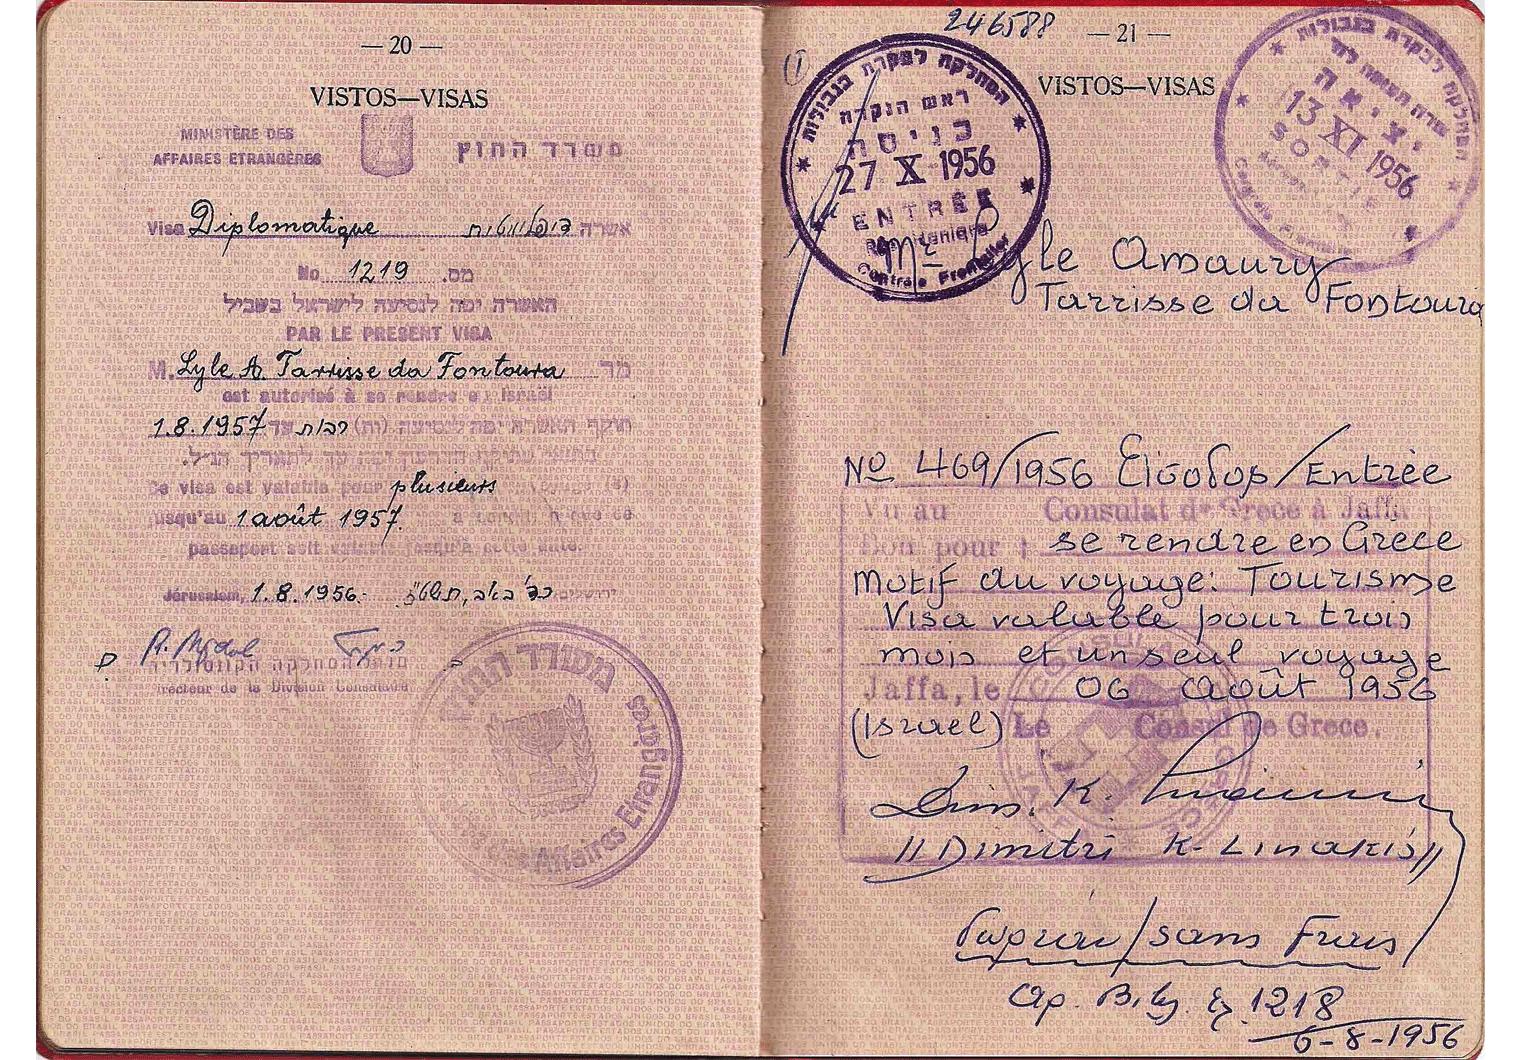 Israeli diplomatic visa